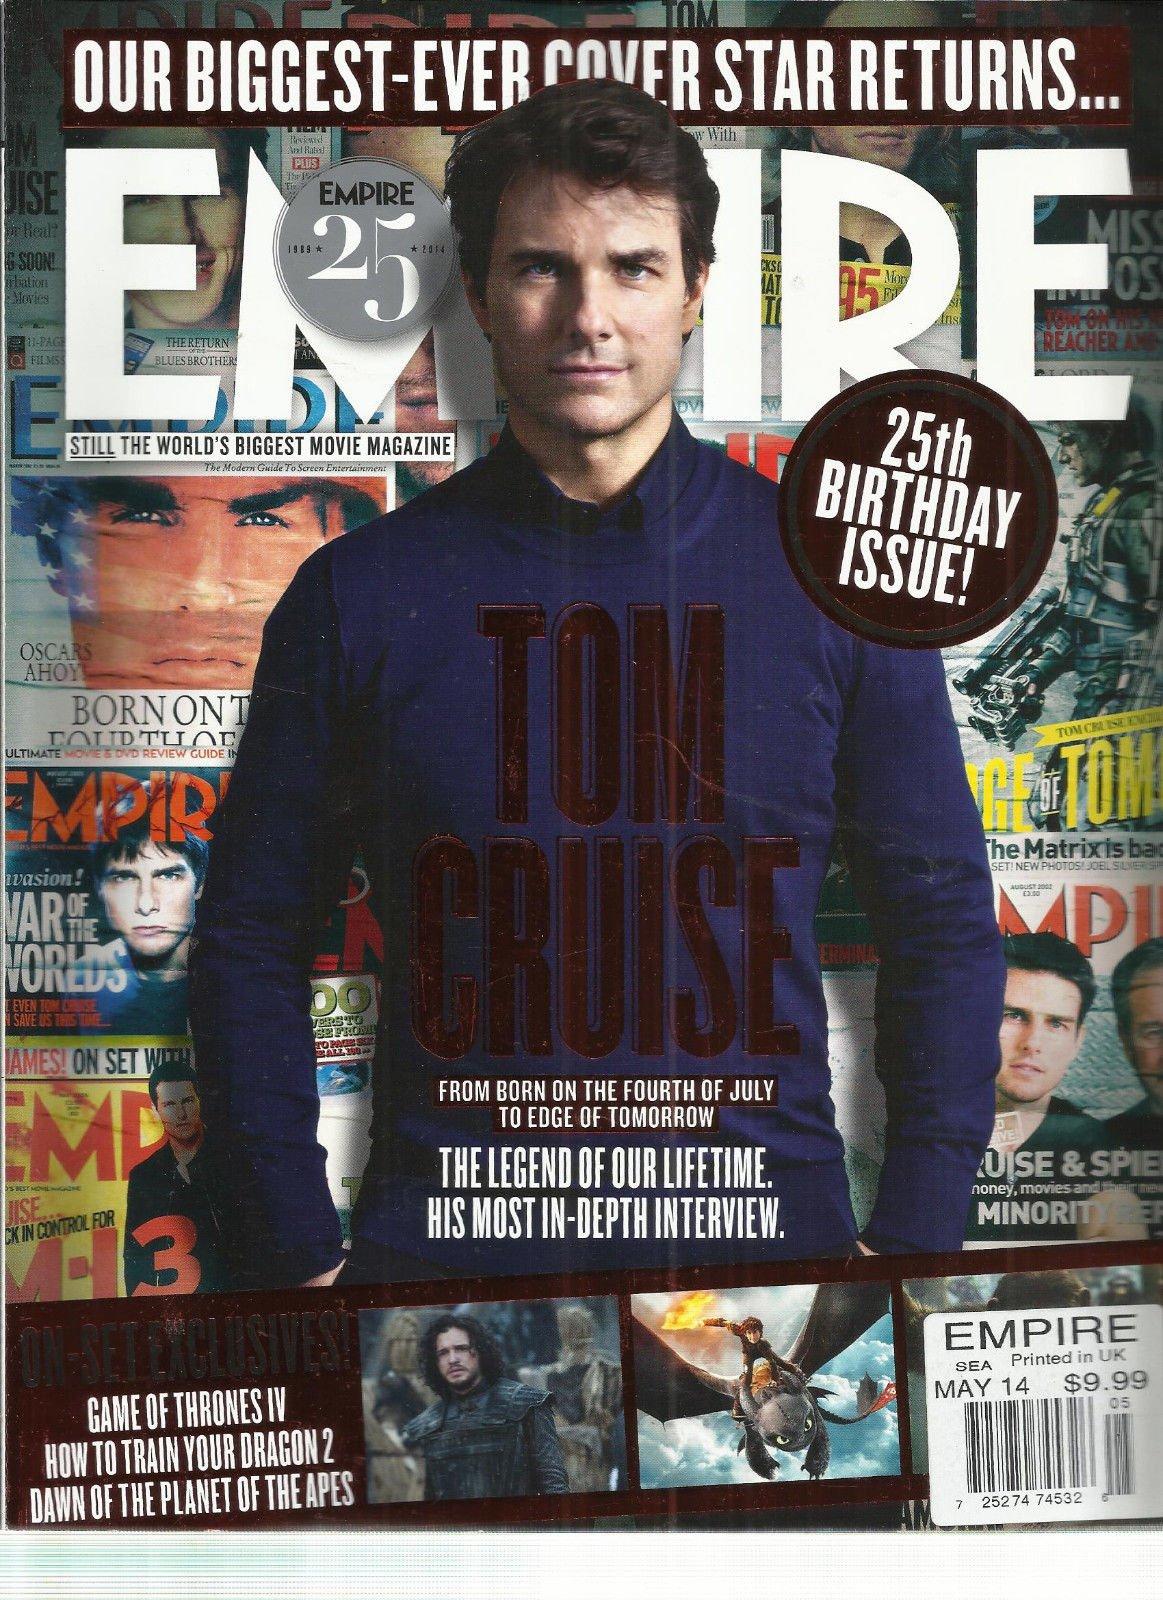 EMPIRE, MAY, 2014 ( THE WORLD'S BIGGEST MOVIE MAGAZINE * 25th BIRTHDAY ISSUE! )